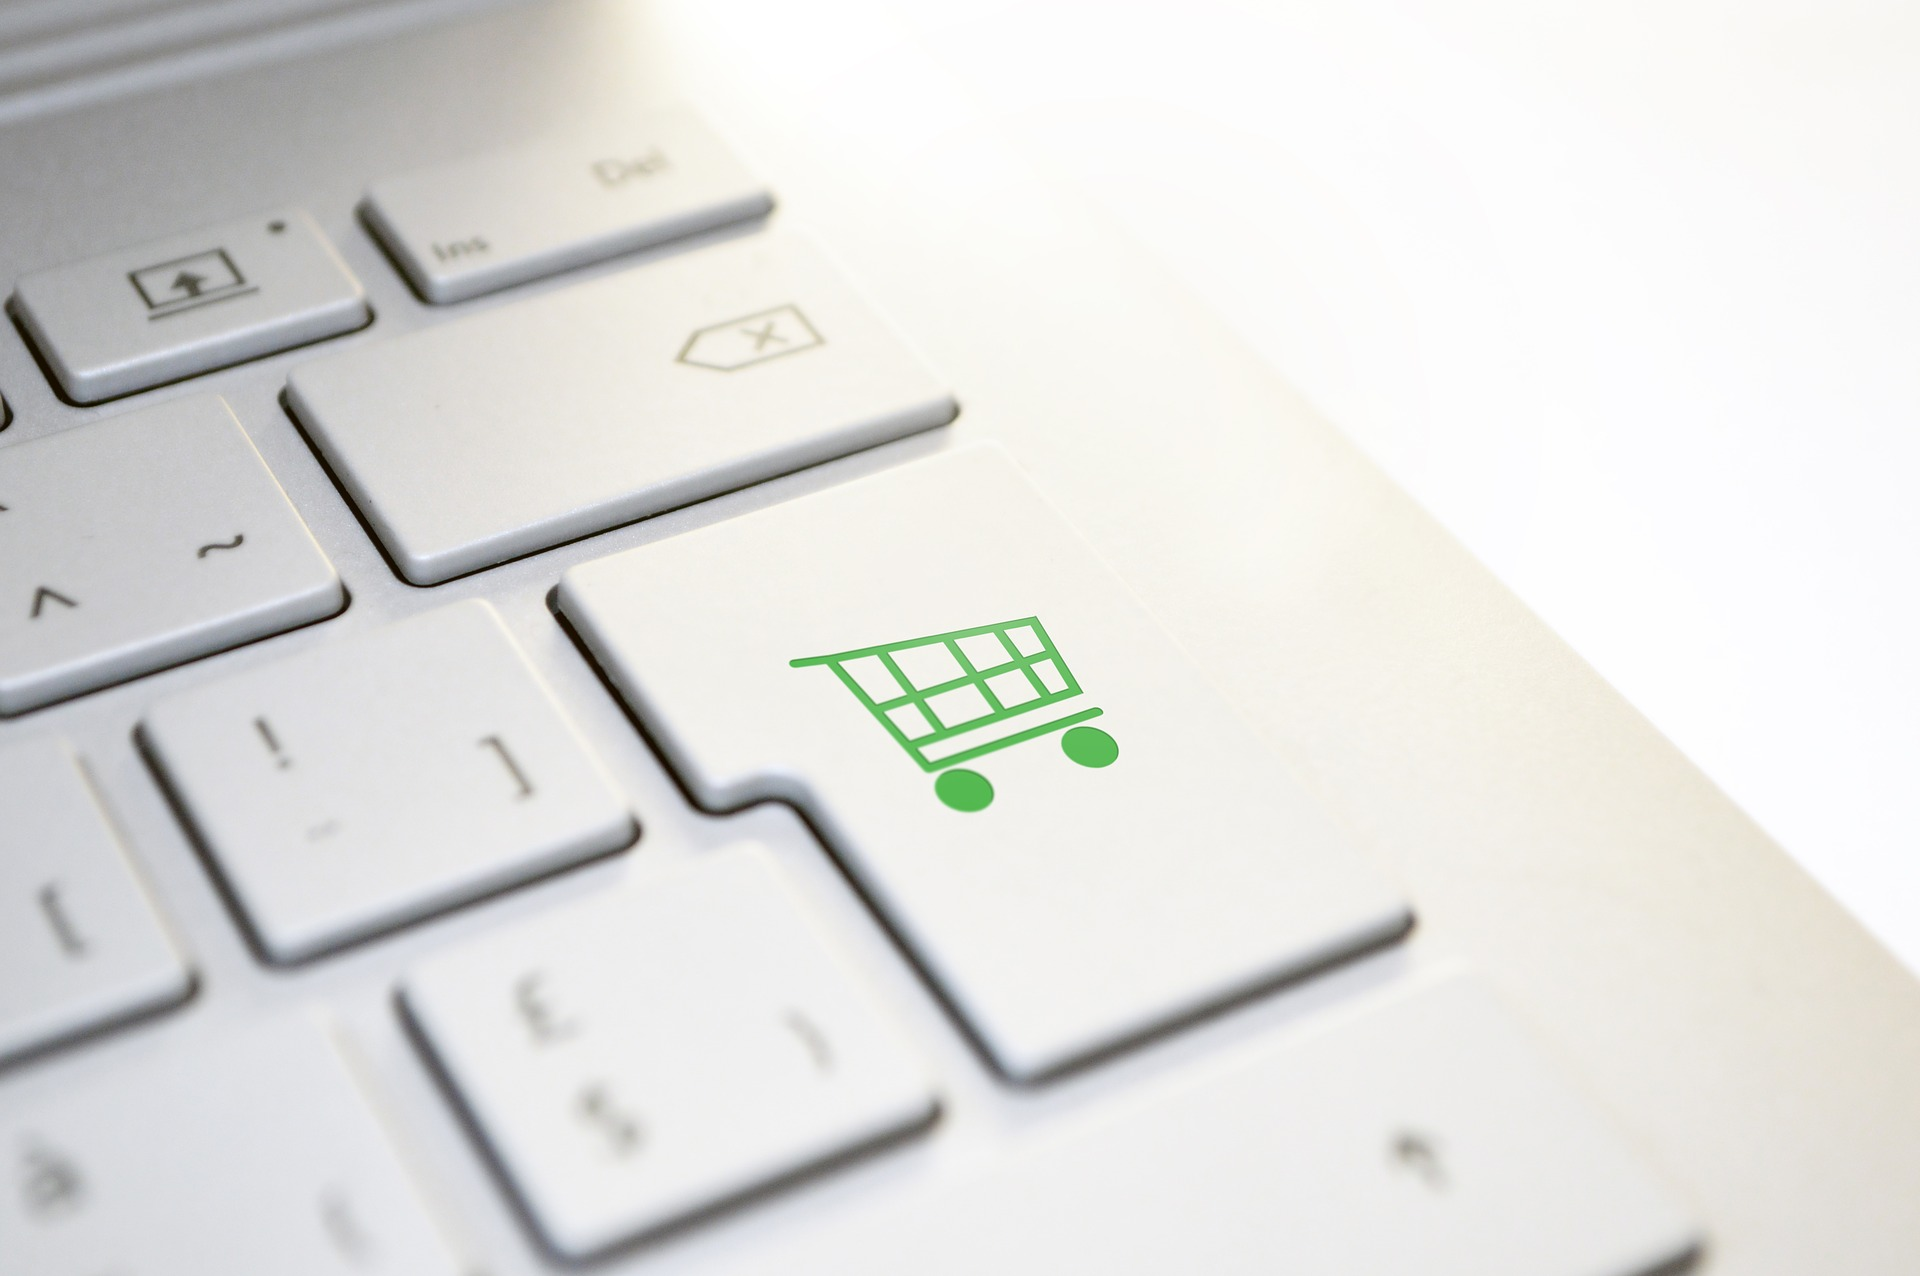 Buy Shopping Cart Keyboard Online Shop Sale